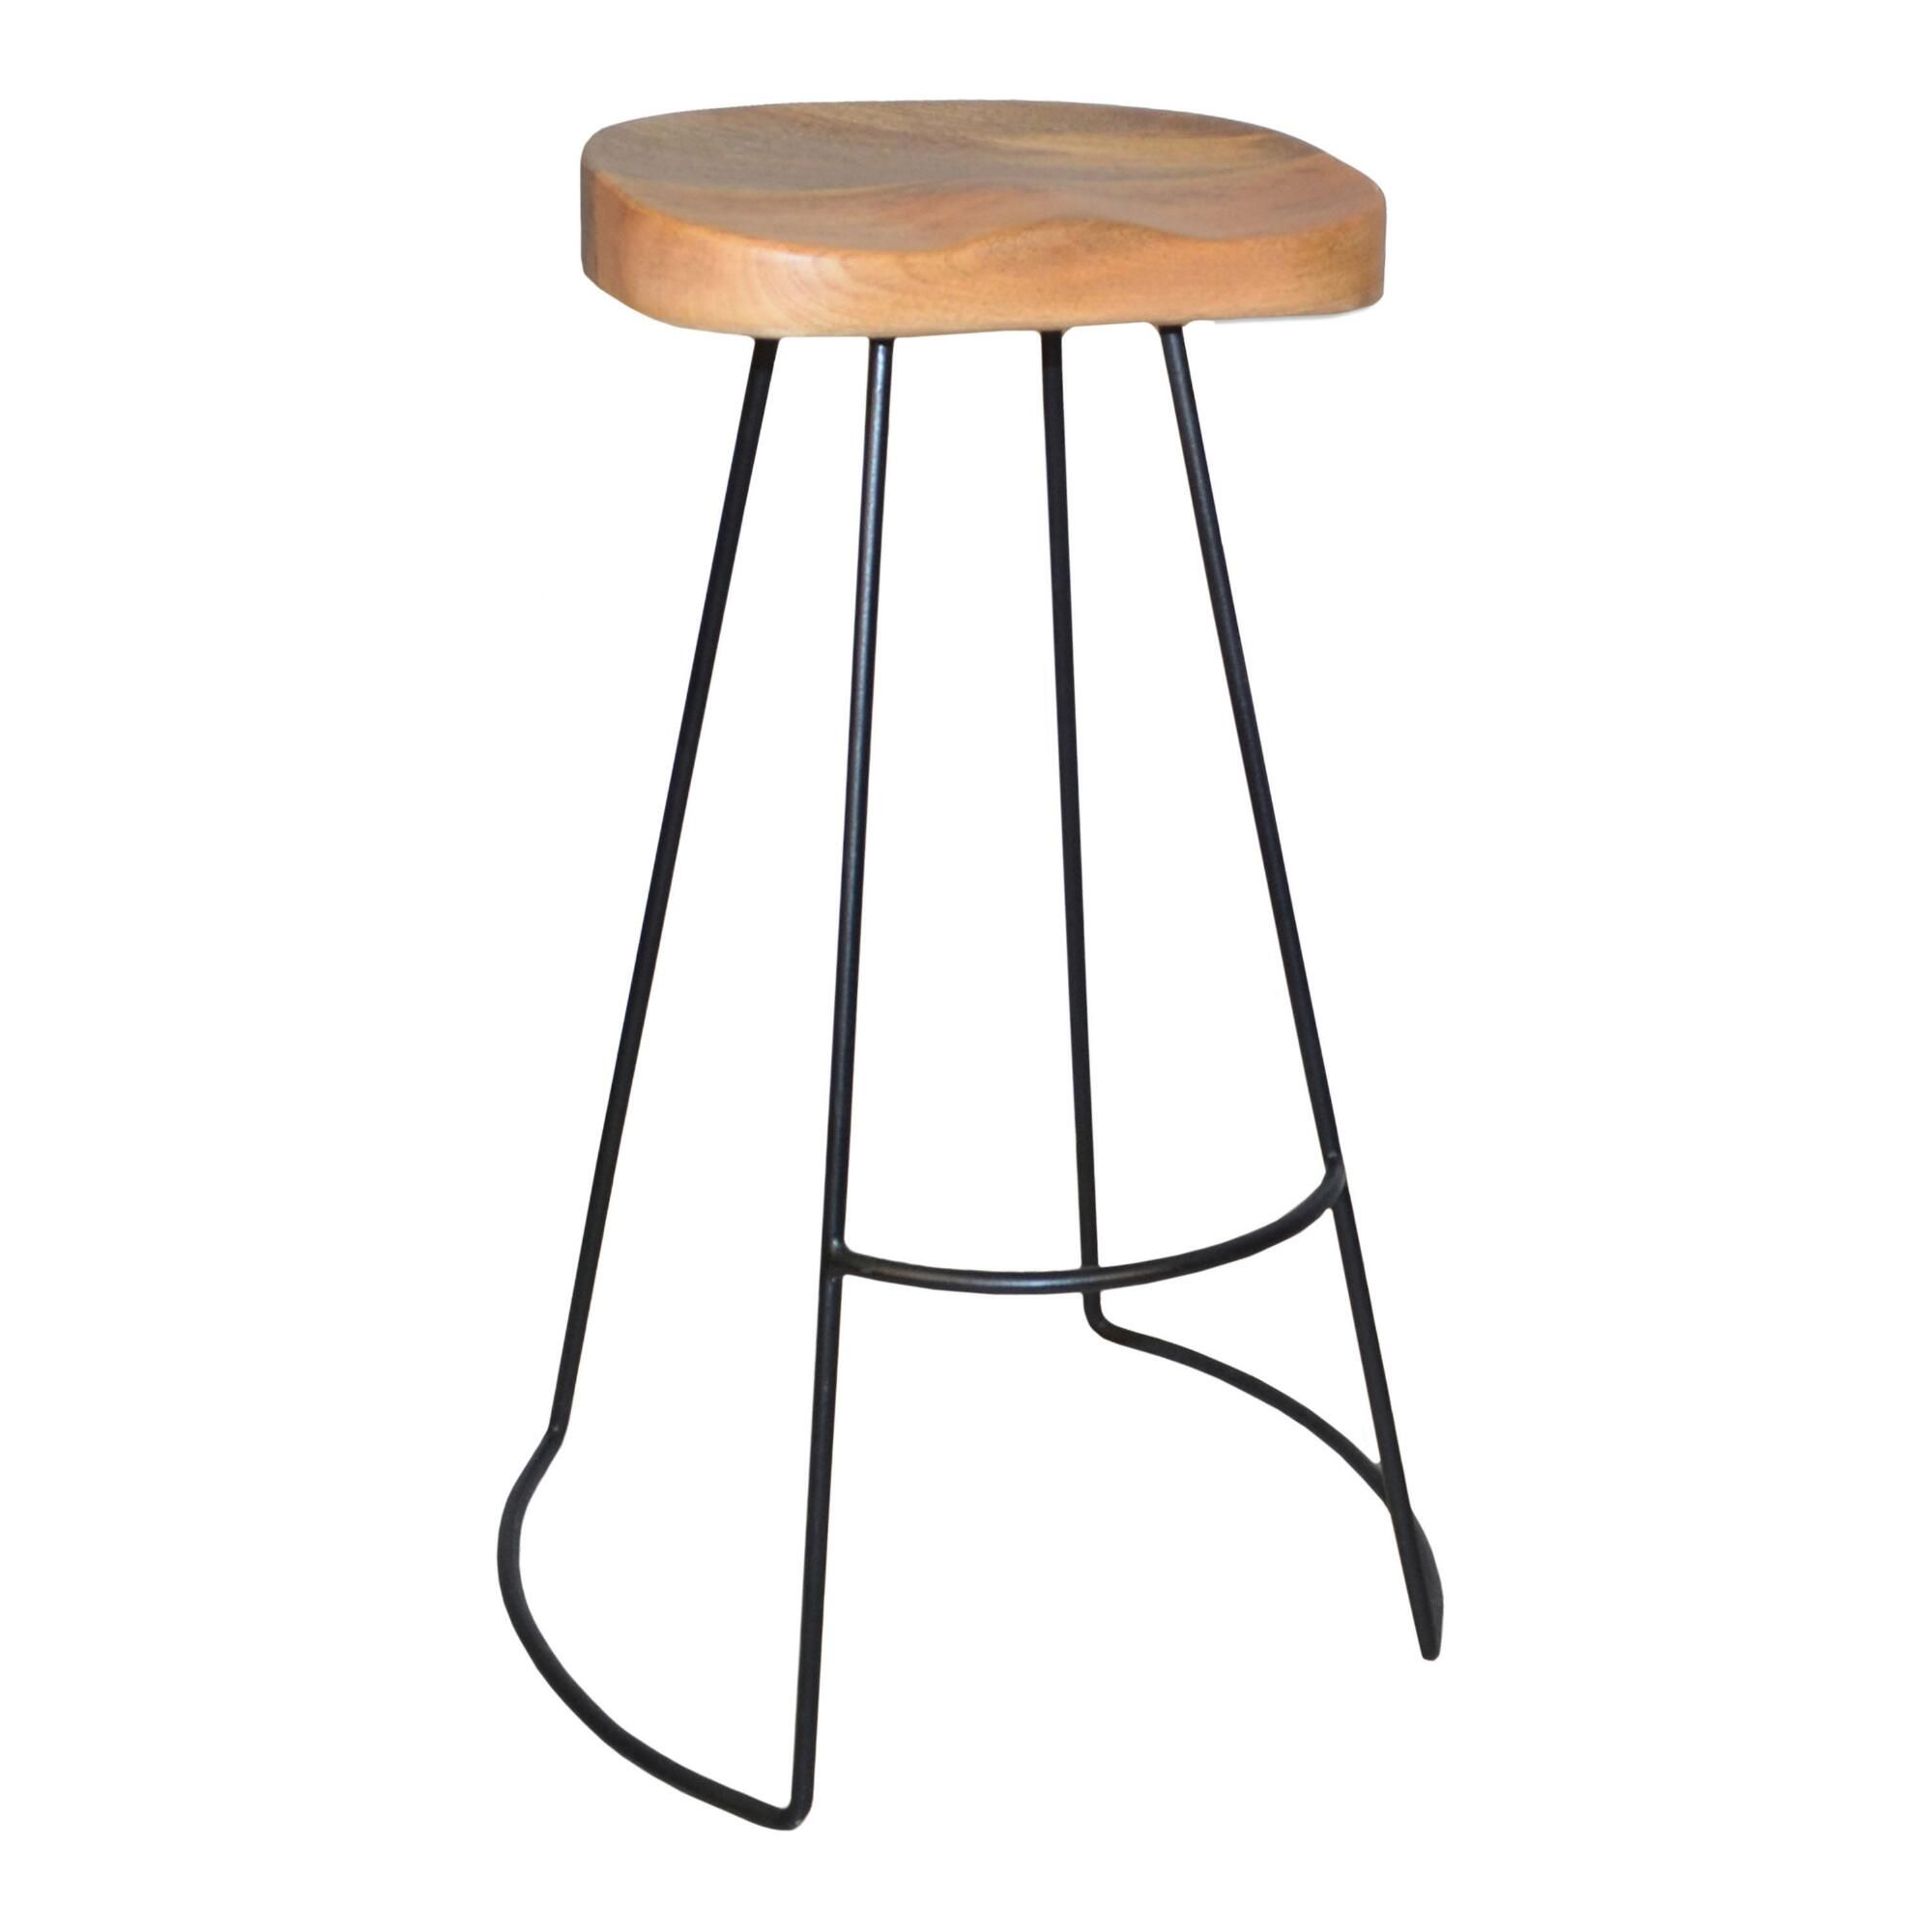 Wood And Metal Backless Porter Barstools Set Of 2 Bar Stools